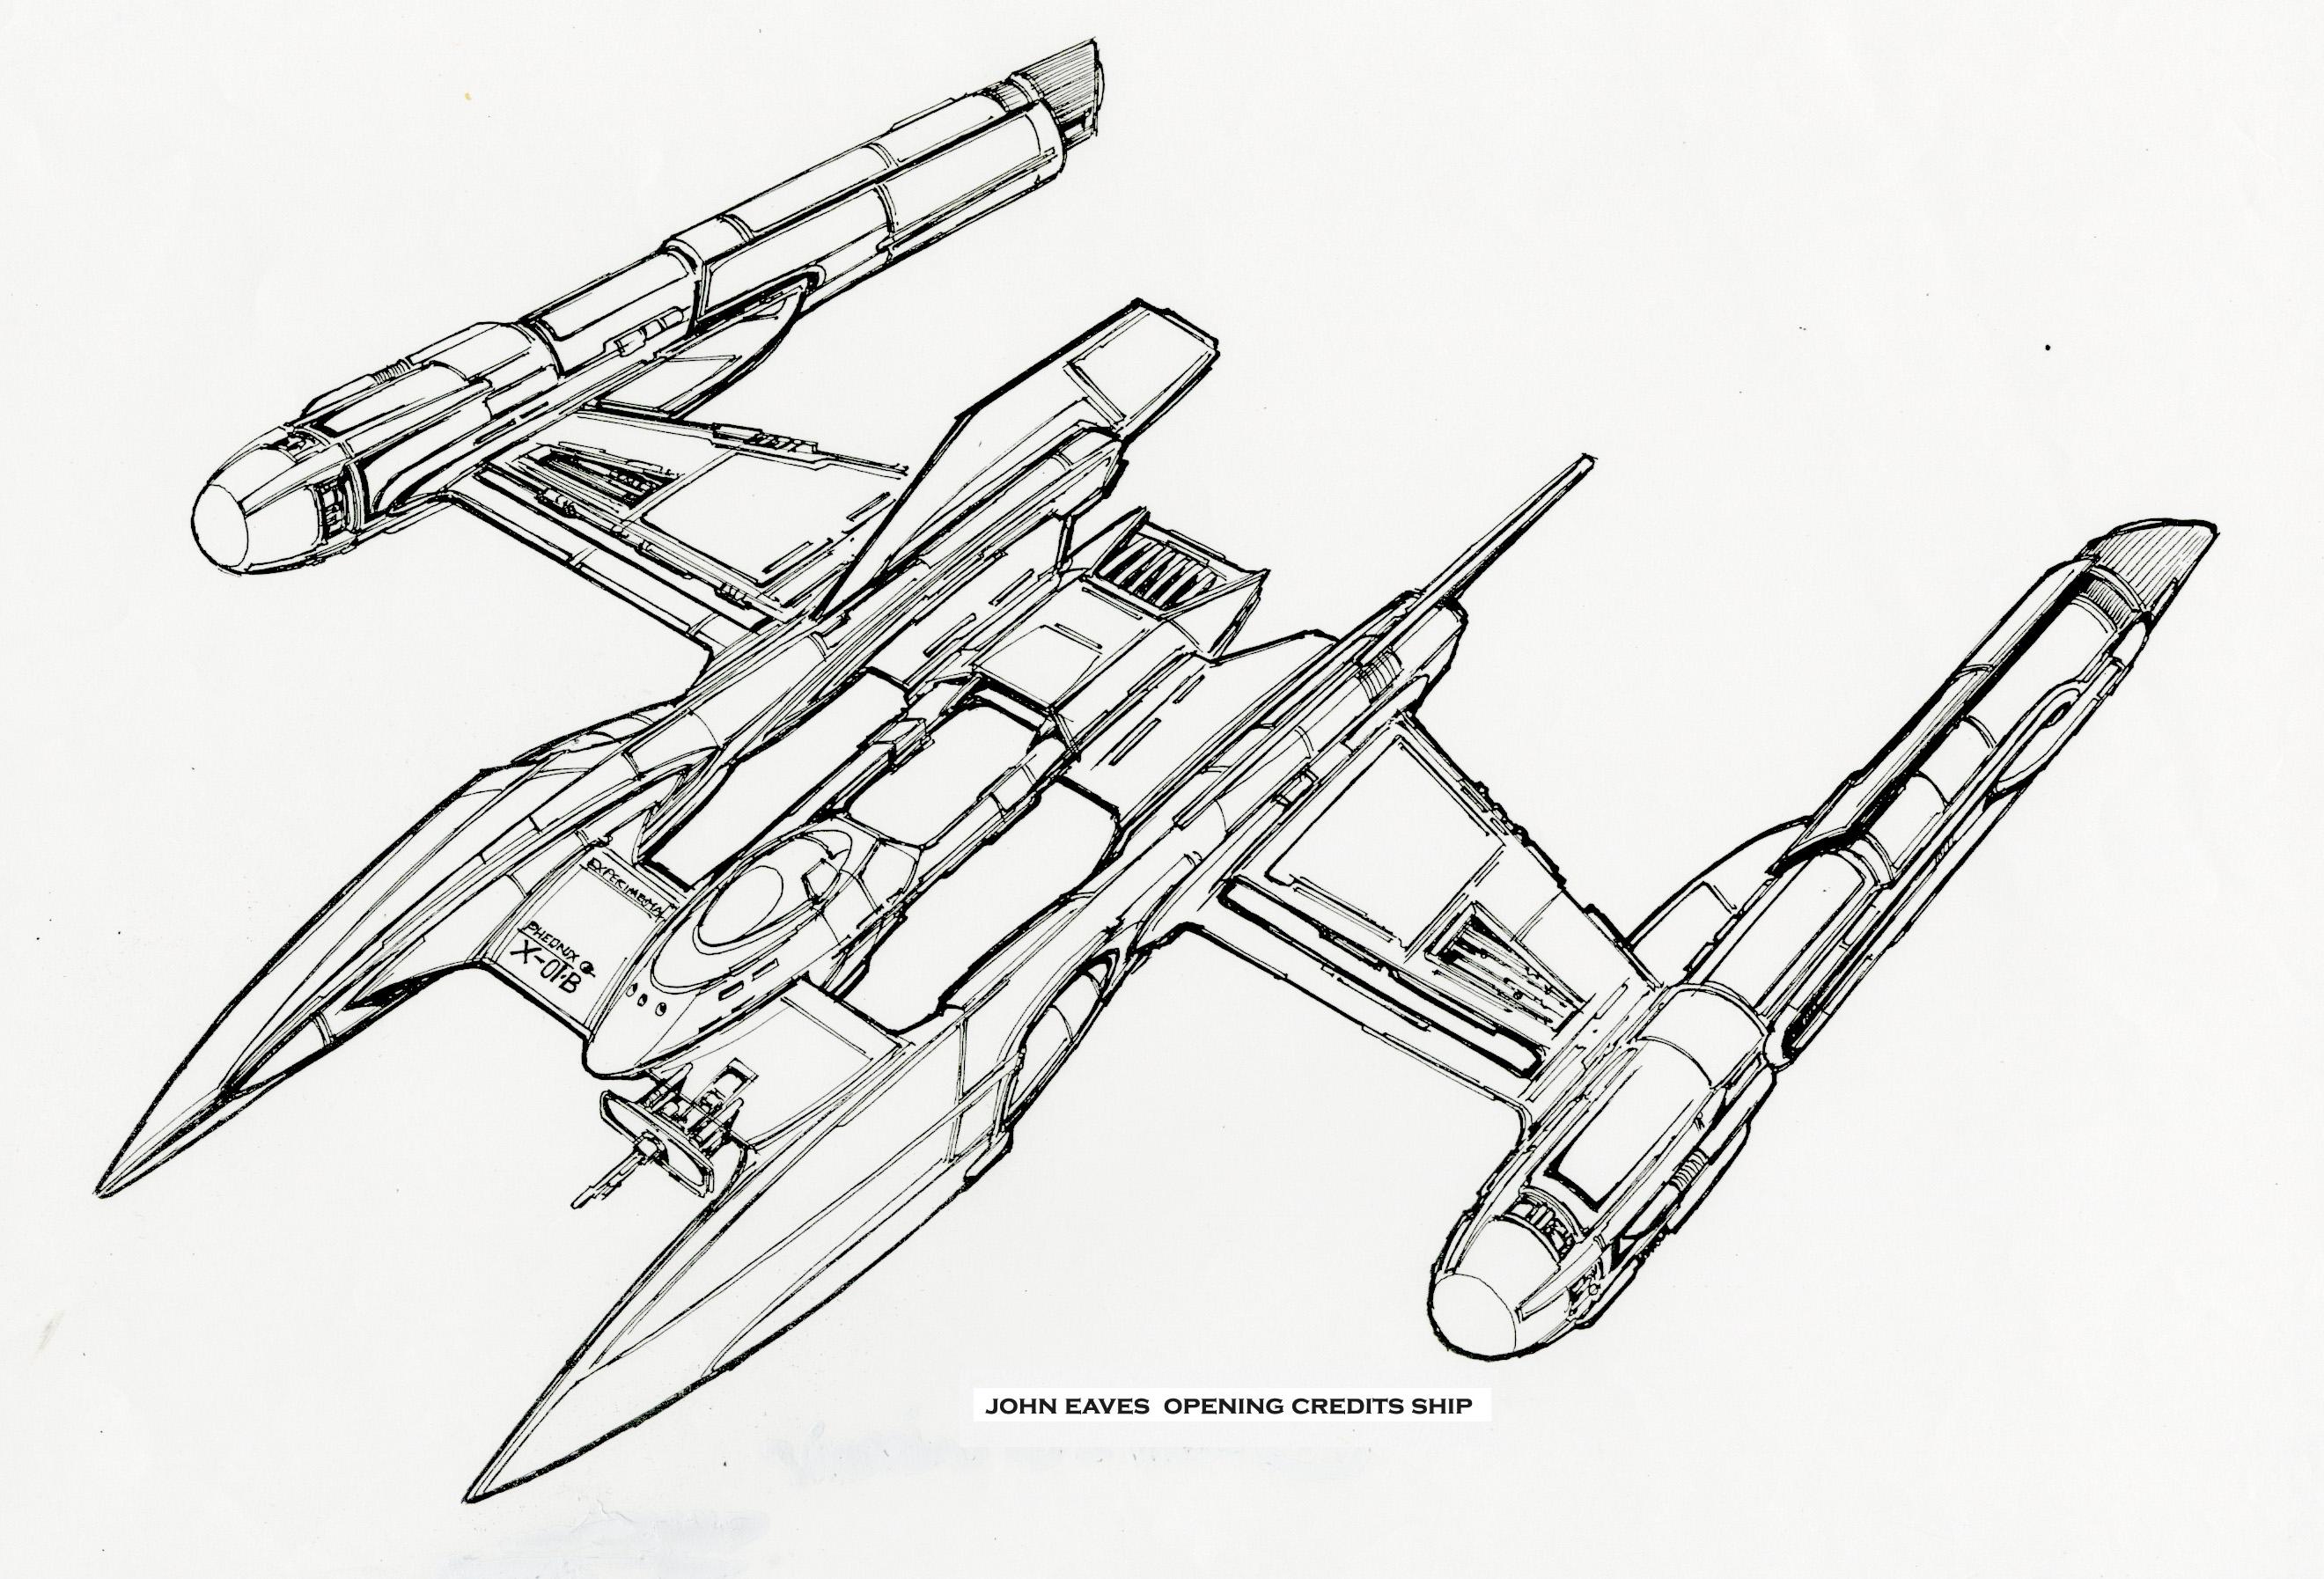 2640x1794 Star Wars Ships Drawings Star Wars Ships Drawings Easy